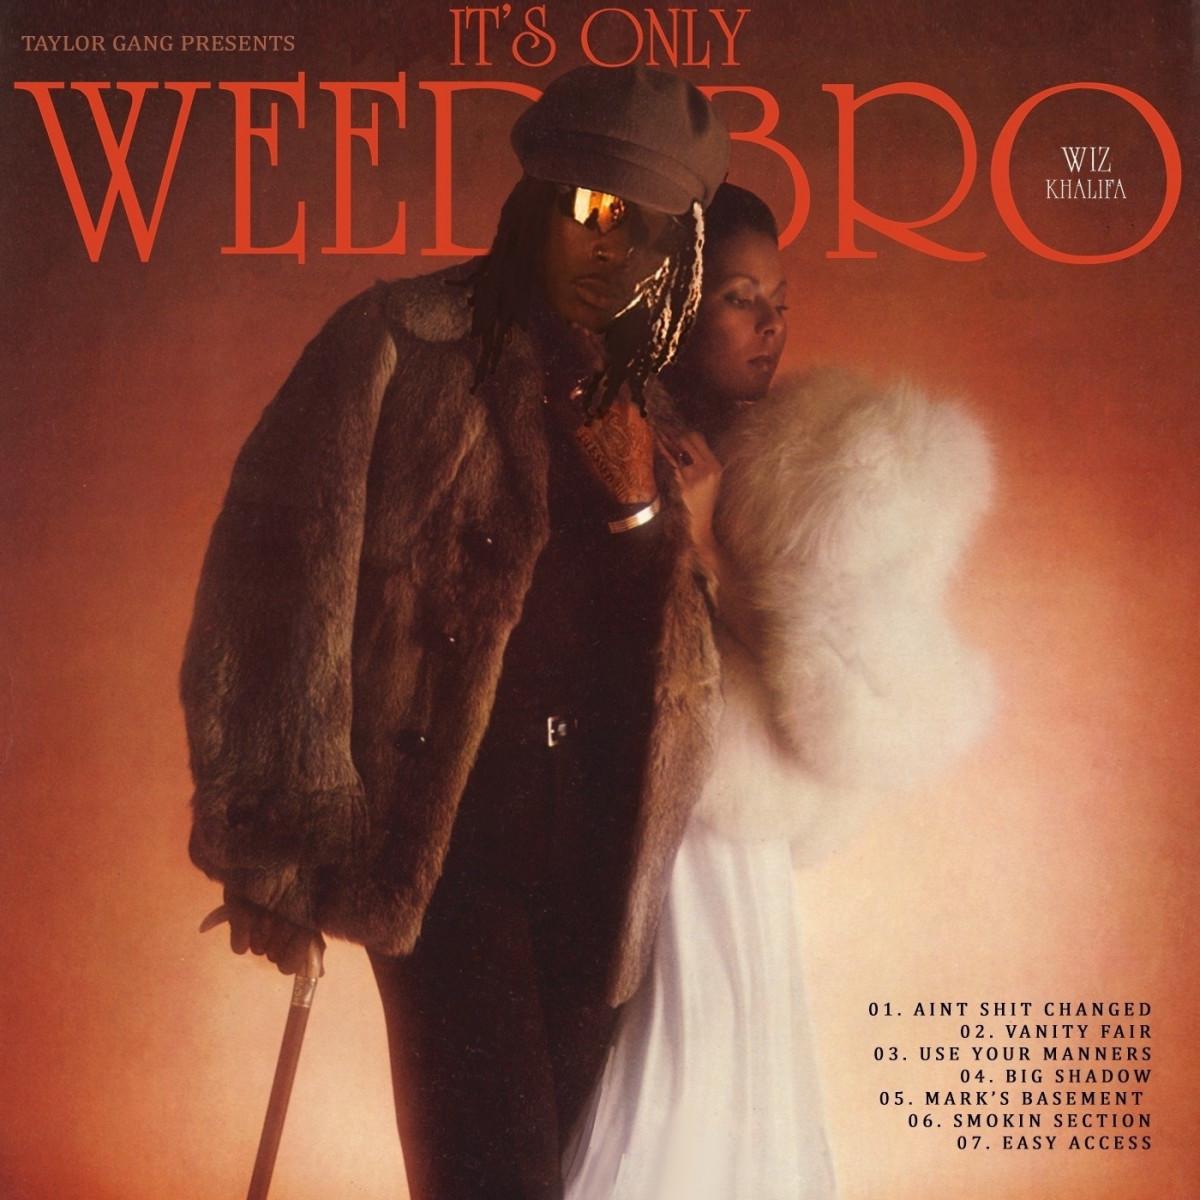 Wiz Khalifa — «It's Only Weed Bro»